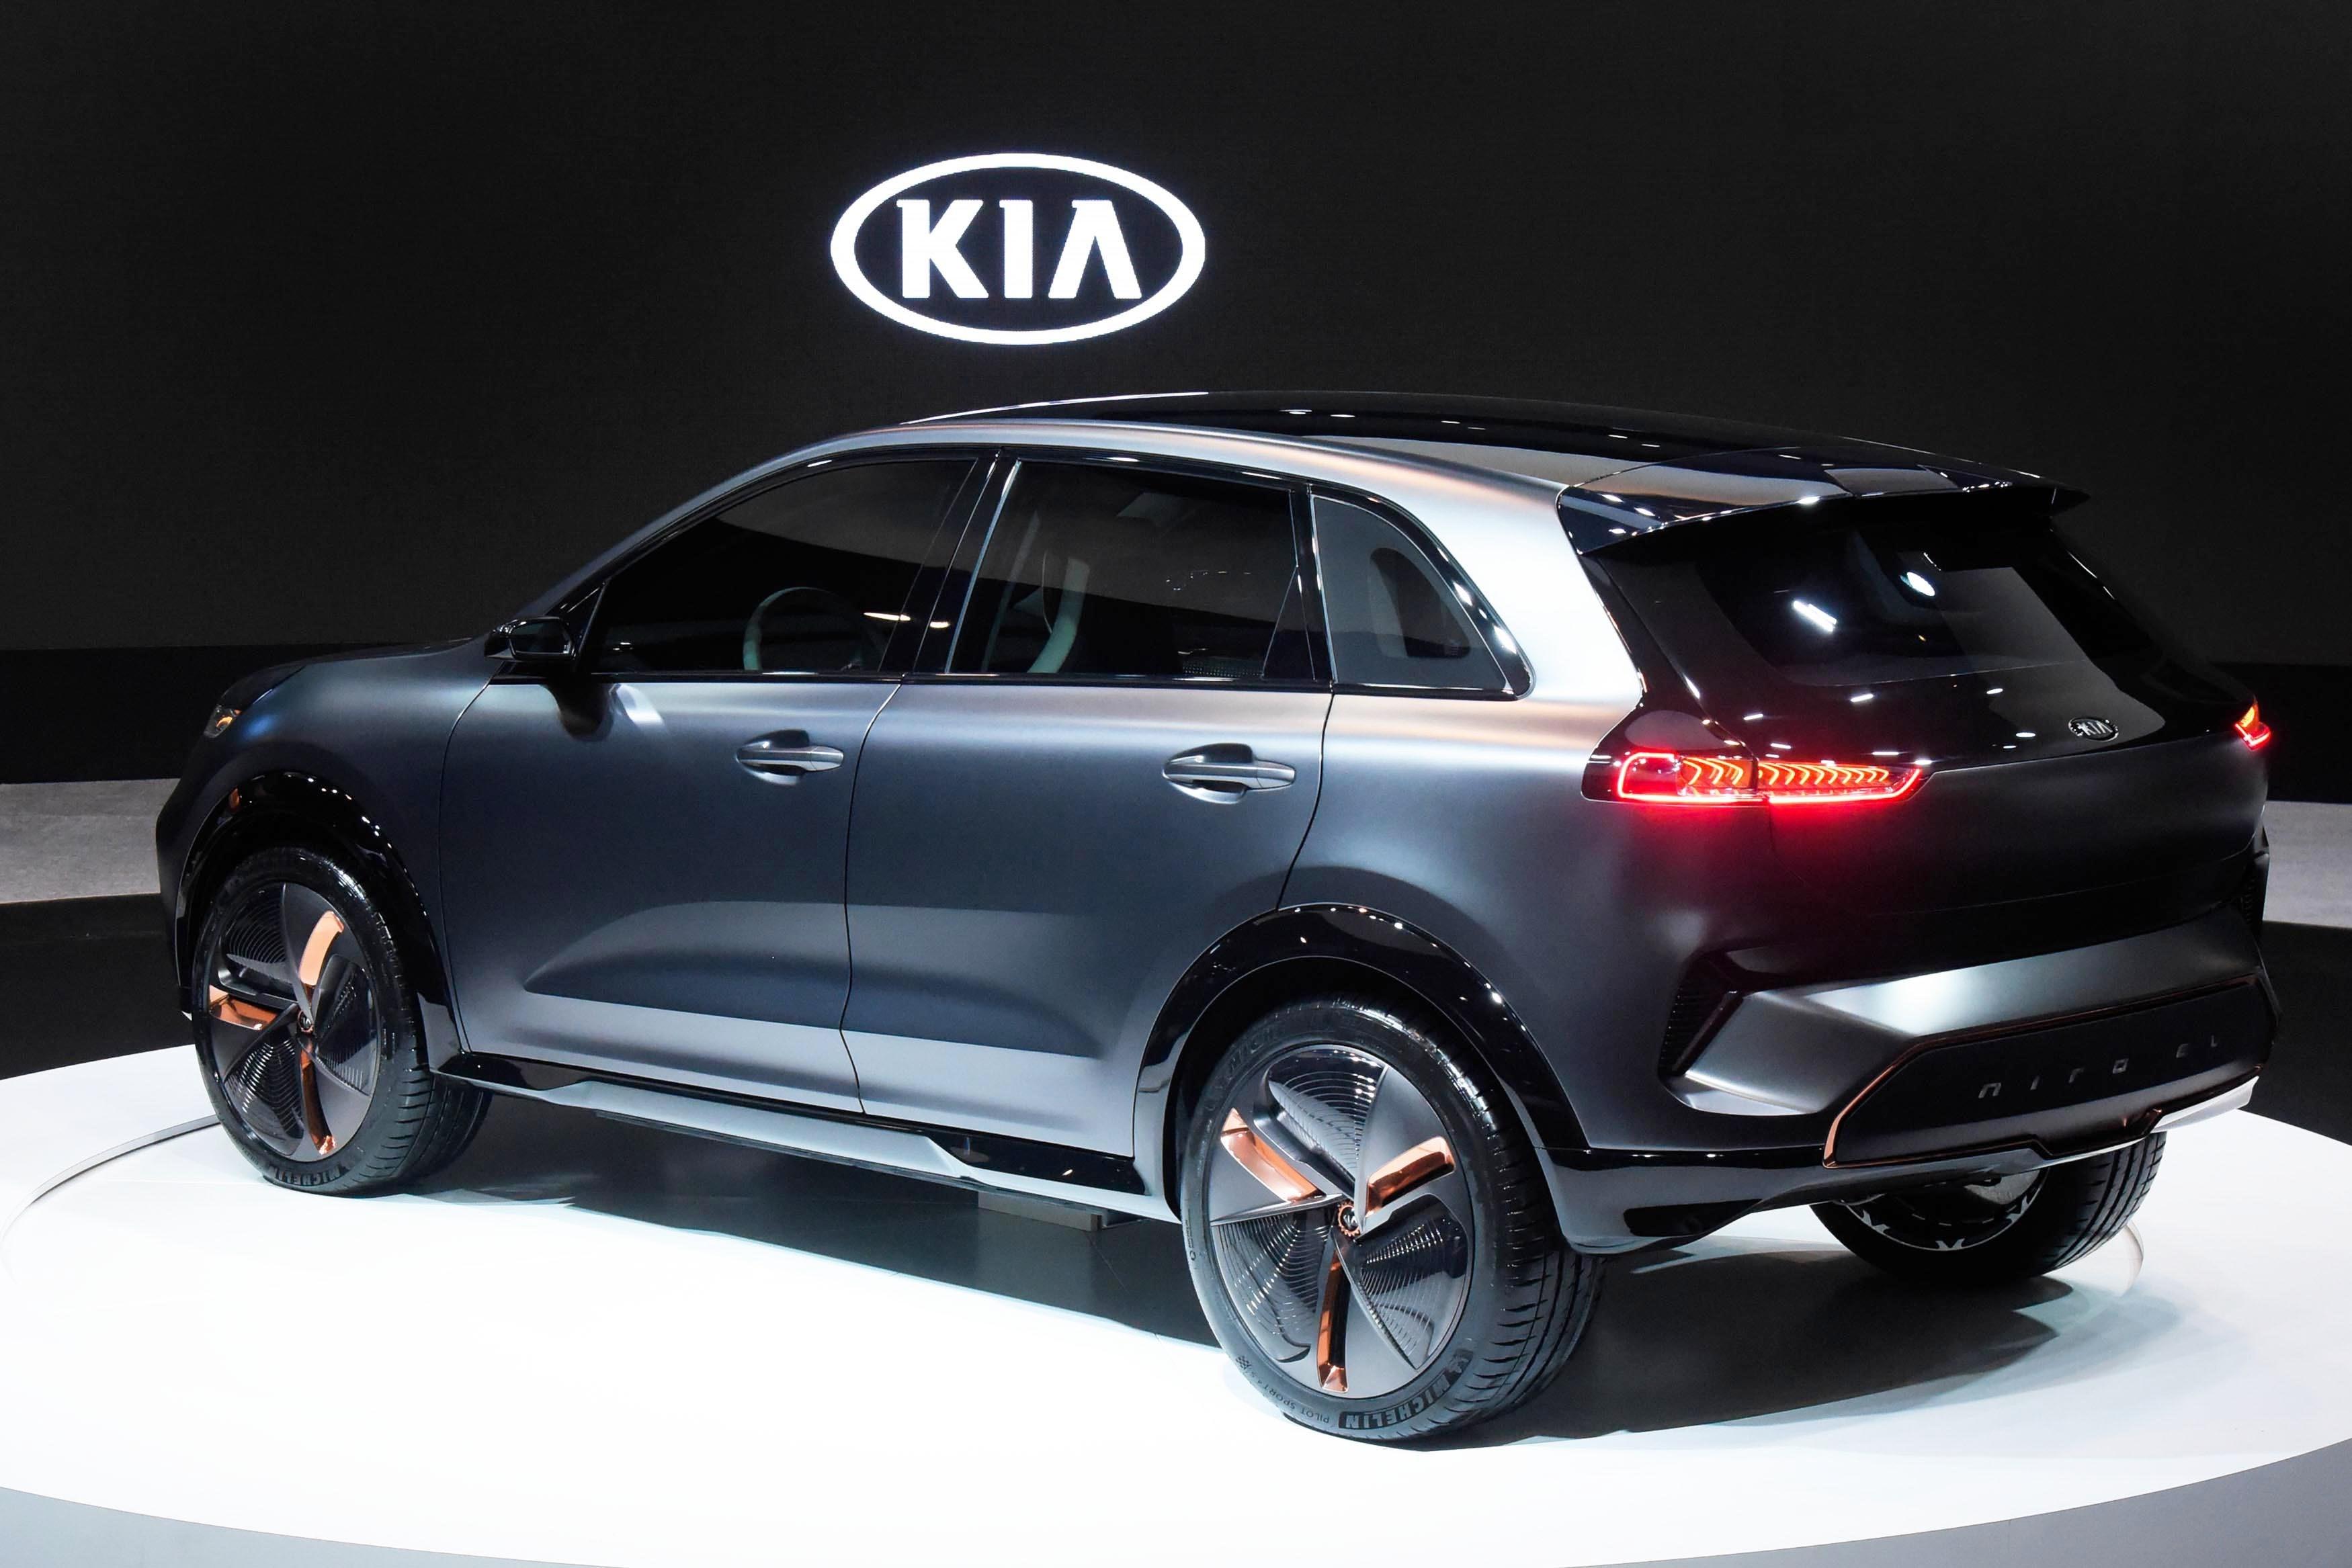 Honda Crv Hybrid >> CES 2018: Kia Niro EV Concept - The Korean Car Blog